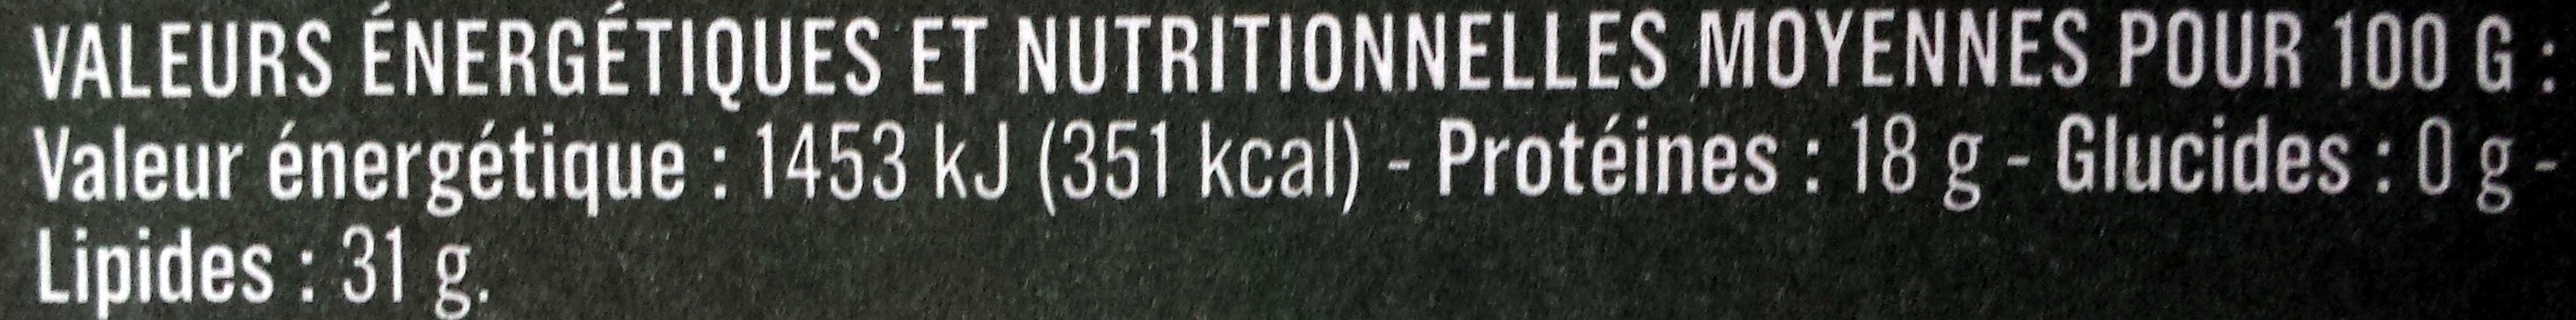 Roquefort AOP au lait cru de brebis (31 % MG) - Voedingswaarden - fr